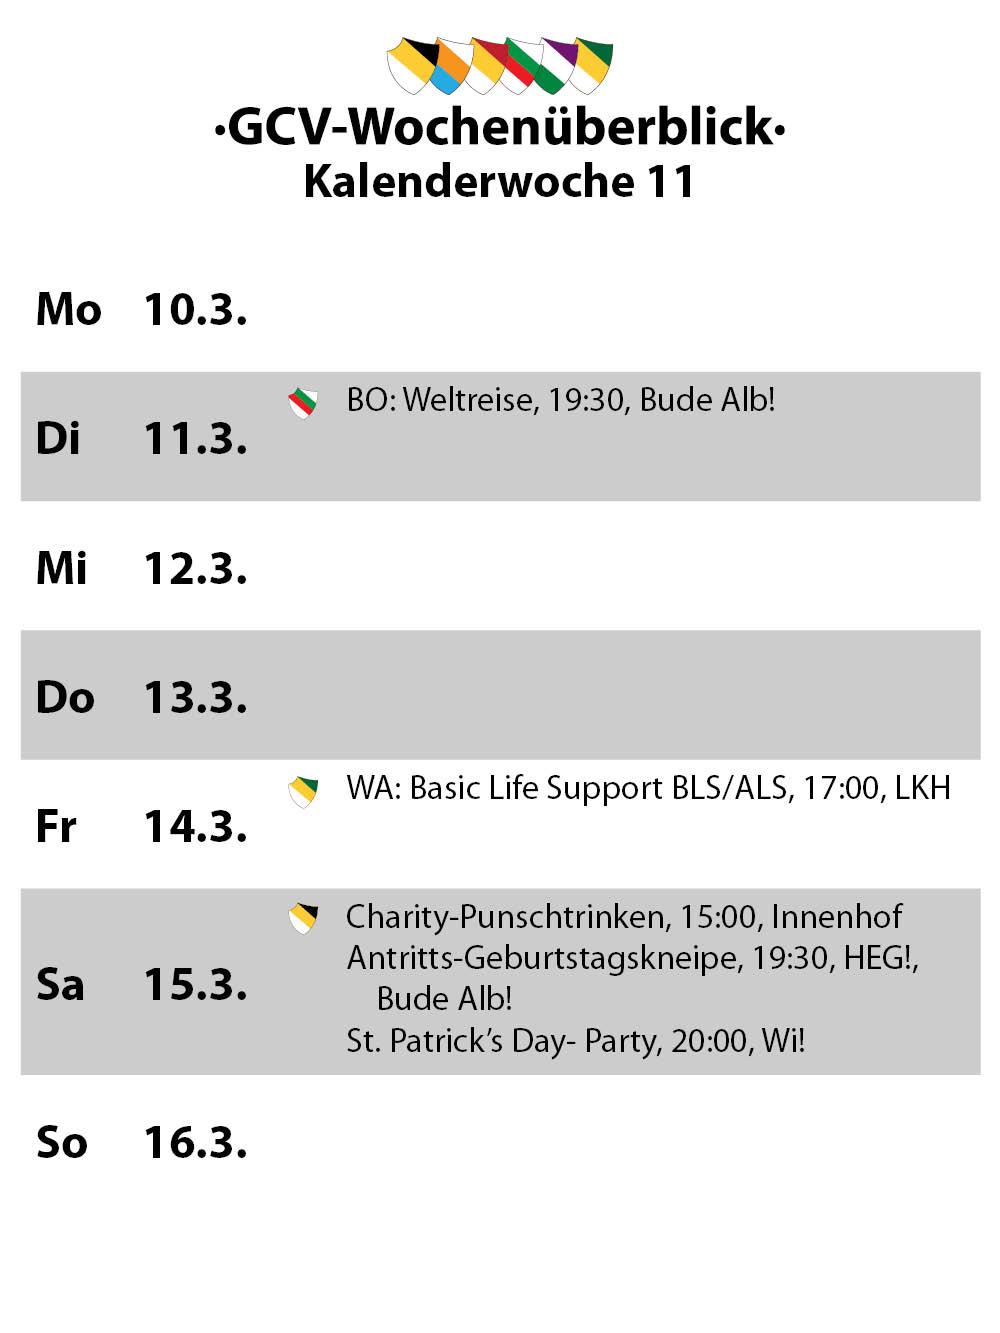 Wochenüberblick KW11